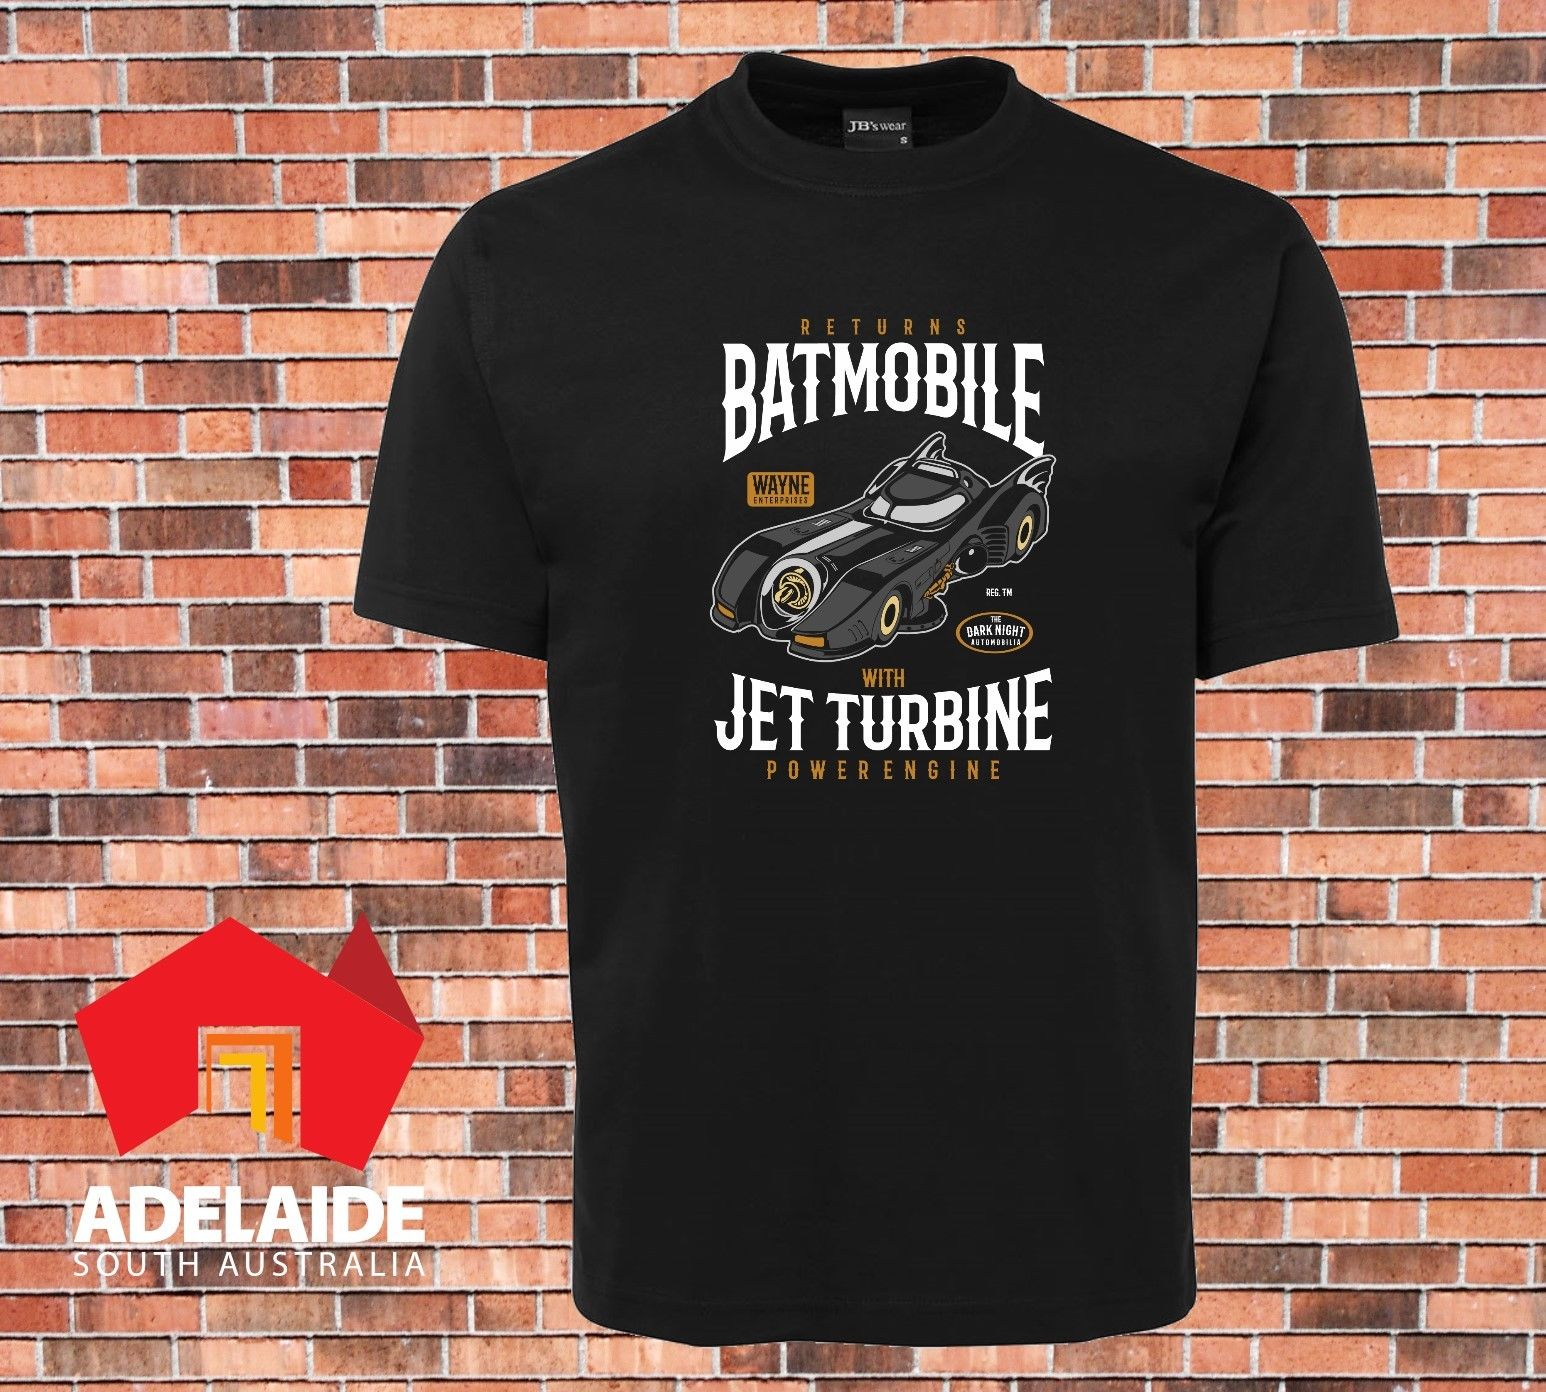 2019 moda Cool negro camiseta Batmobile Returns Dark Knight Batman nuevo diseño camiseta